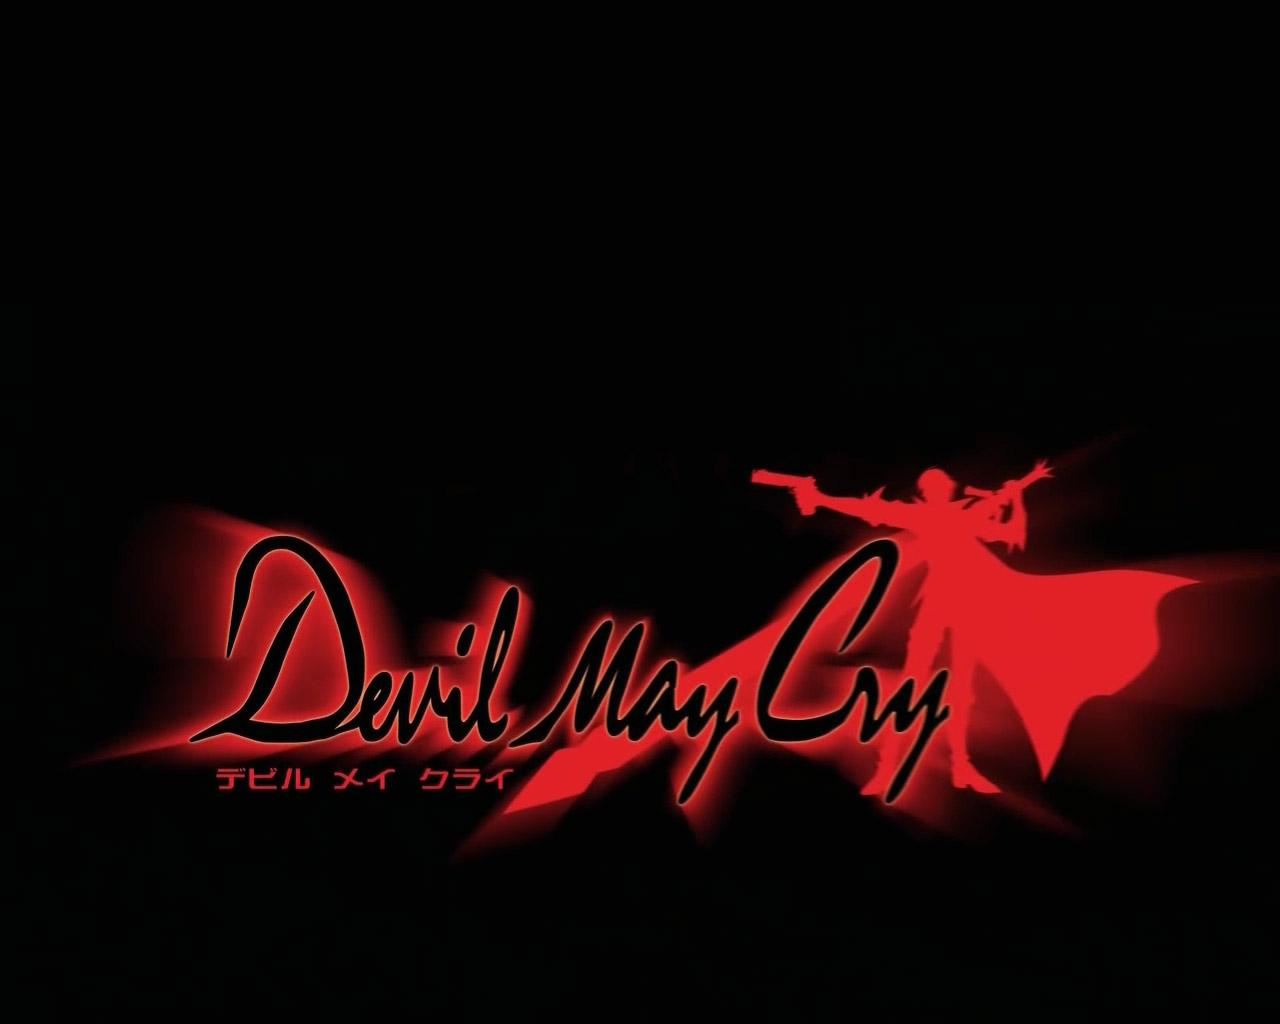 http://2.bp.blogspot.com/-nBzLnHFg-3U/TgQAy8Sl1OI/AAAAAAAAAKs/RTJV7-mHmkY/s1600/devil-may-cry-wallpaper-120.jpg